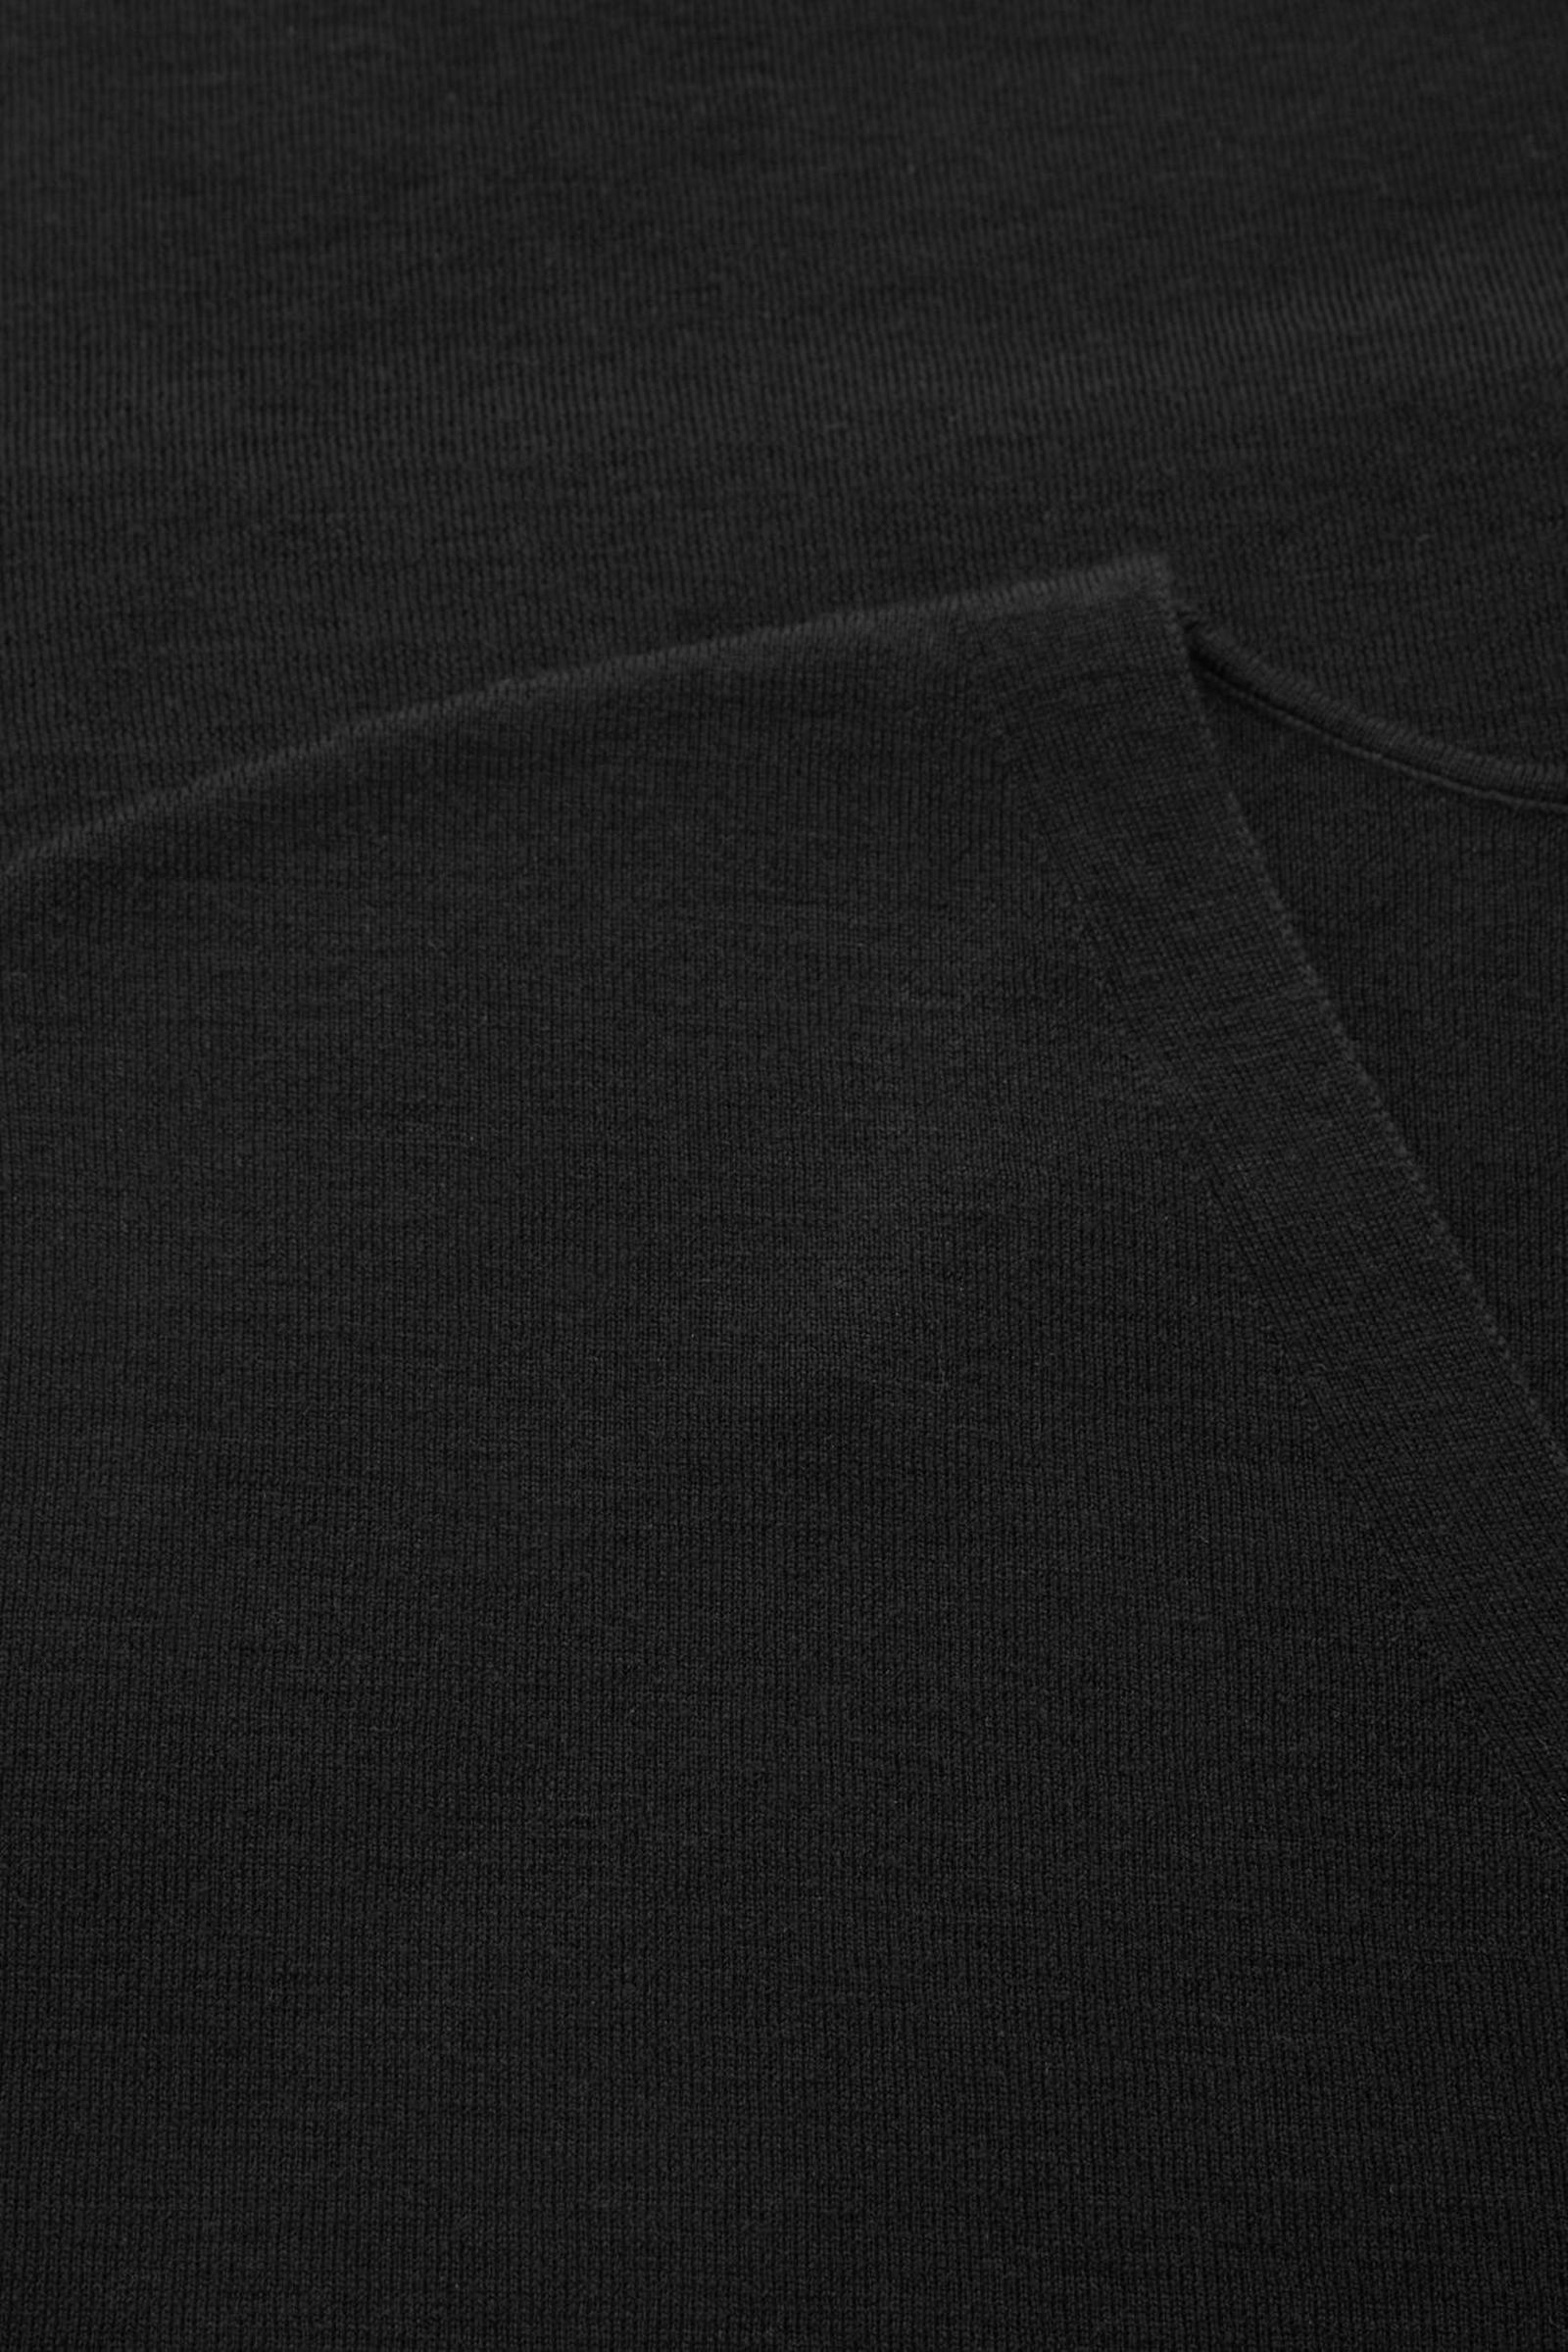 COS 스트레이트 울 튜닉의 블랙컬러 Detail입니다.